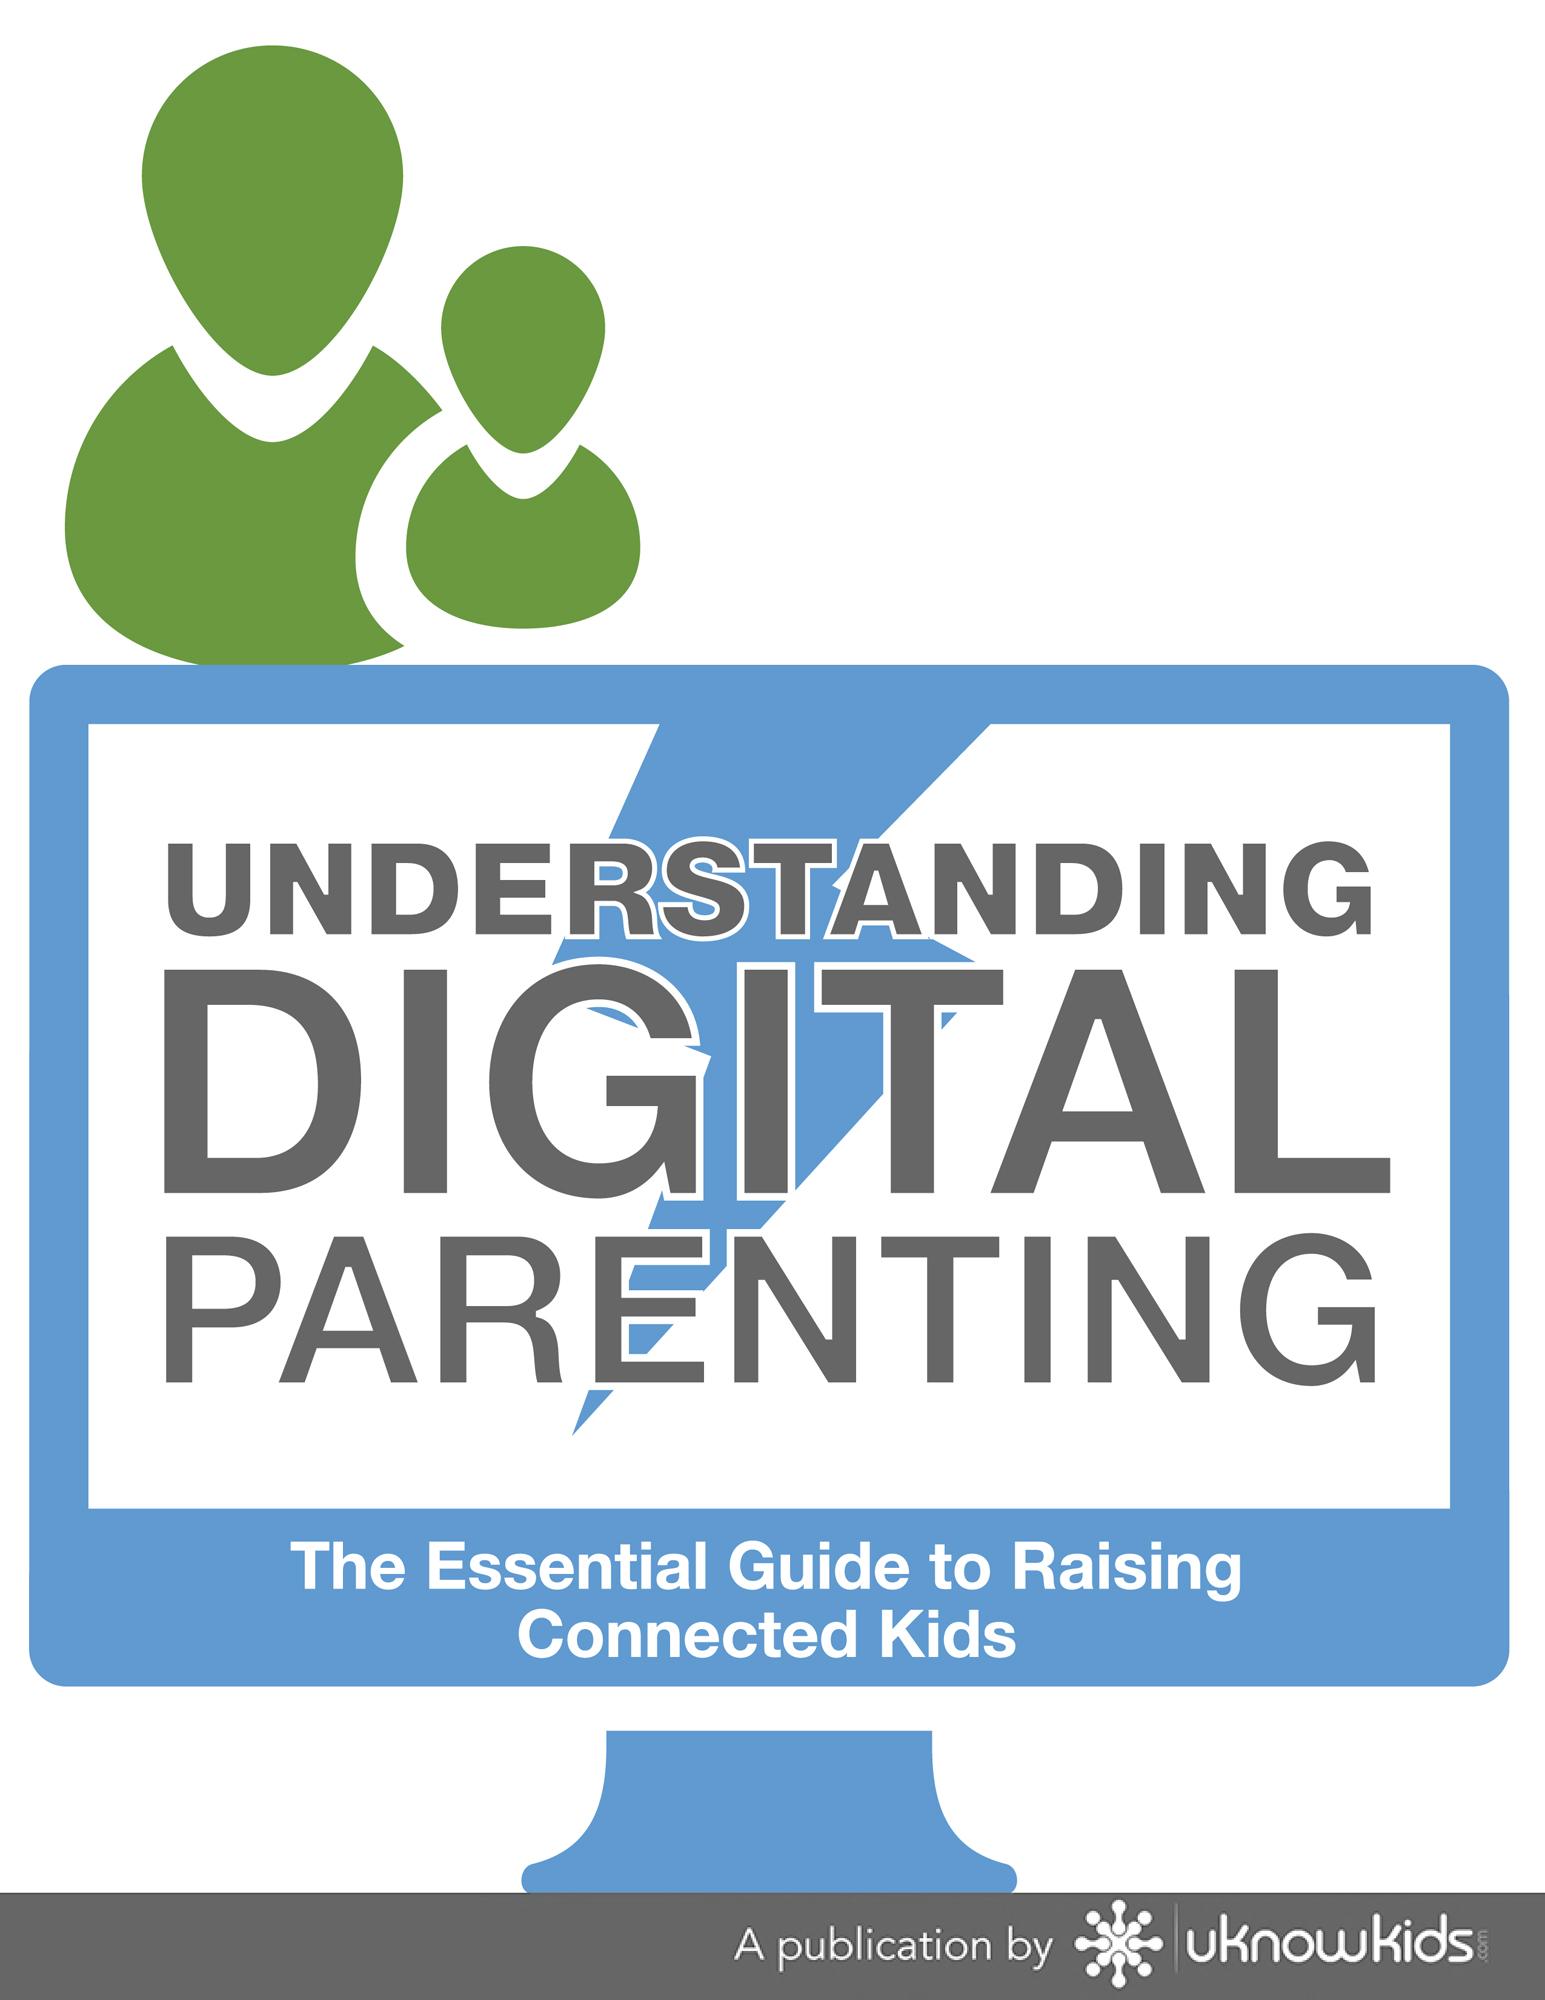 digital parenting, online parenting